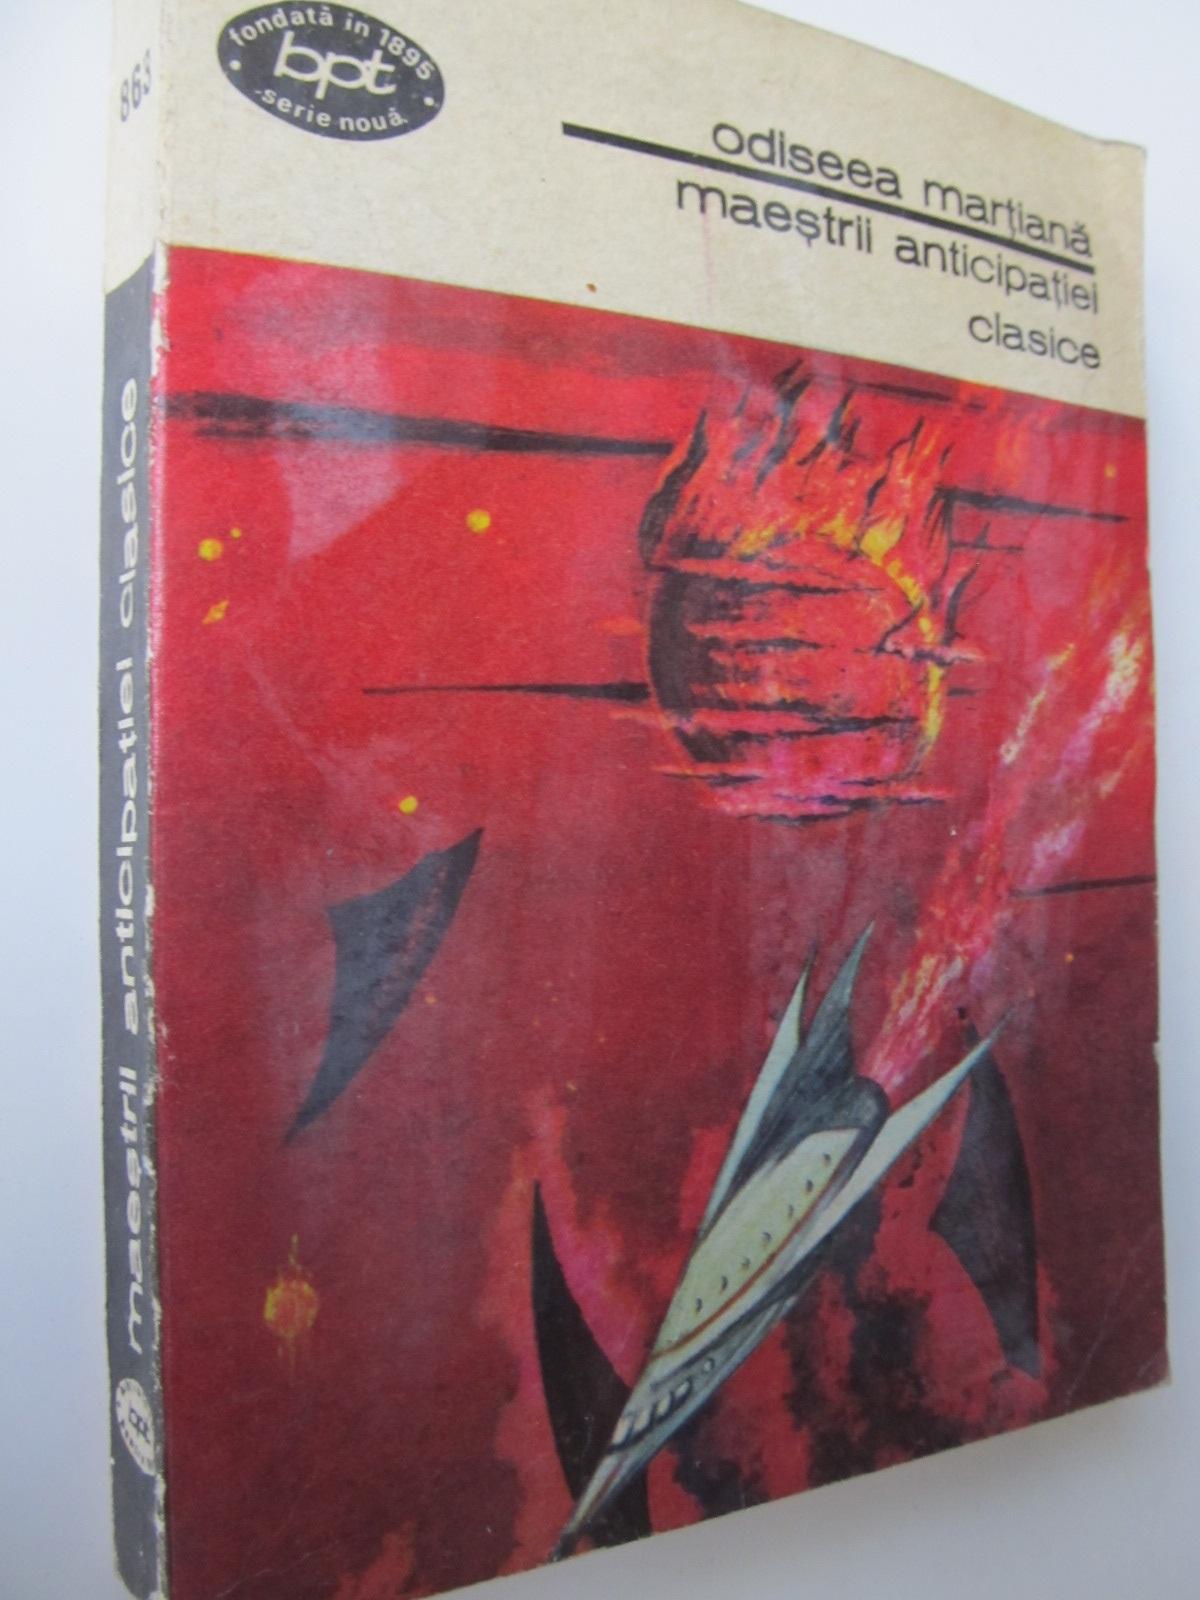 Odiseea martiana - maestrii anticipatiei clasice - Edgar Allan Poe , H.G.Wells , Jules Verne , ... | Detalii carte